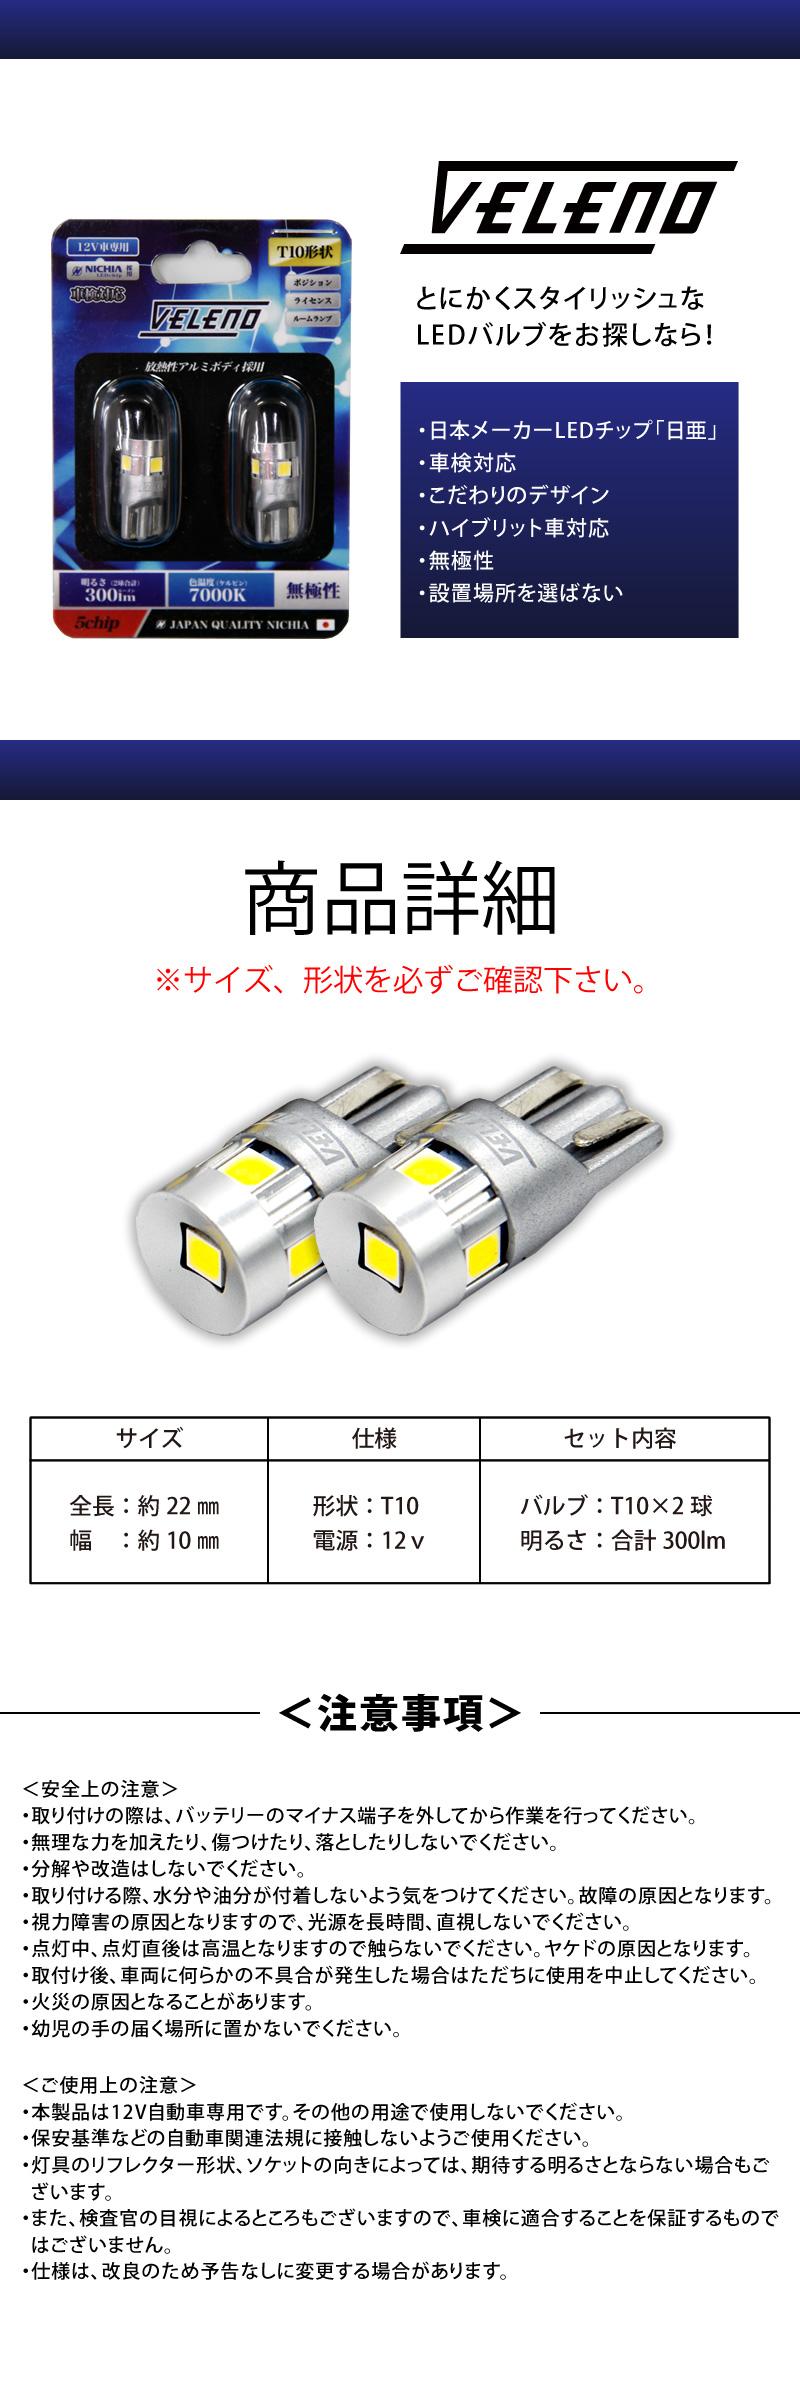 T10,LED,ポジションランプ,日亜チップ,5chip,300lm,VELENO,純白,純正同様の配光,ハイブリッド車対応,2球セット,車検対応,送料無料